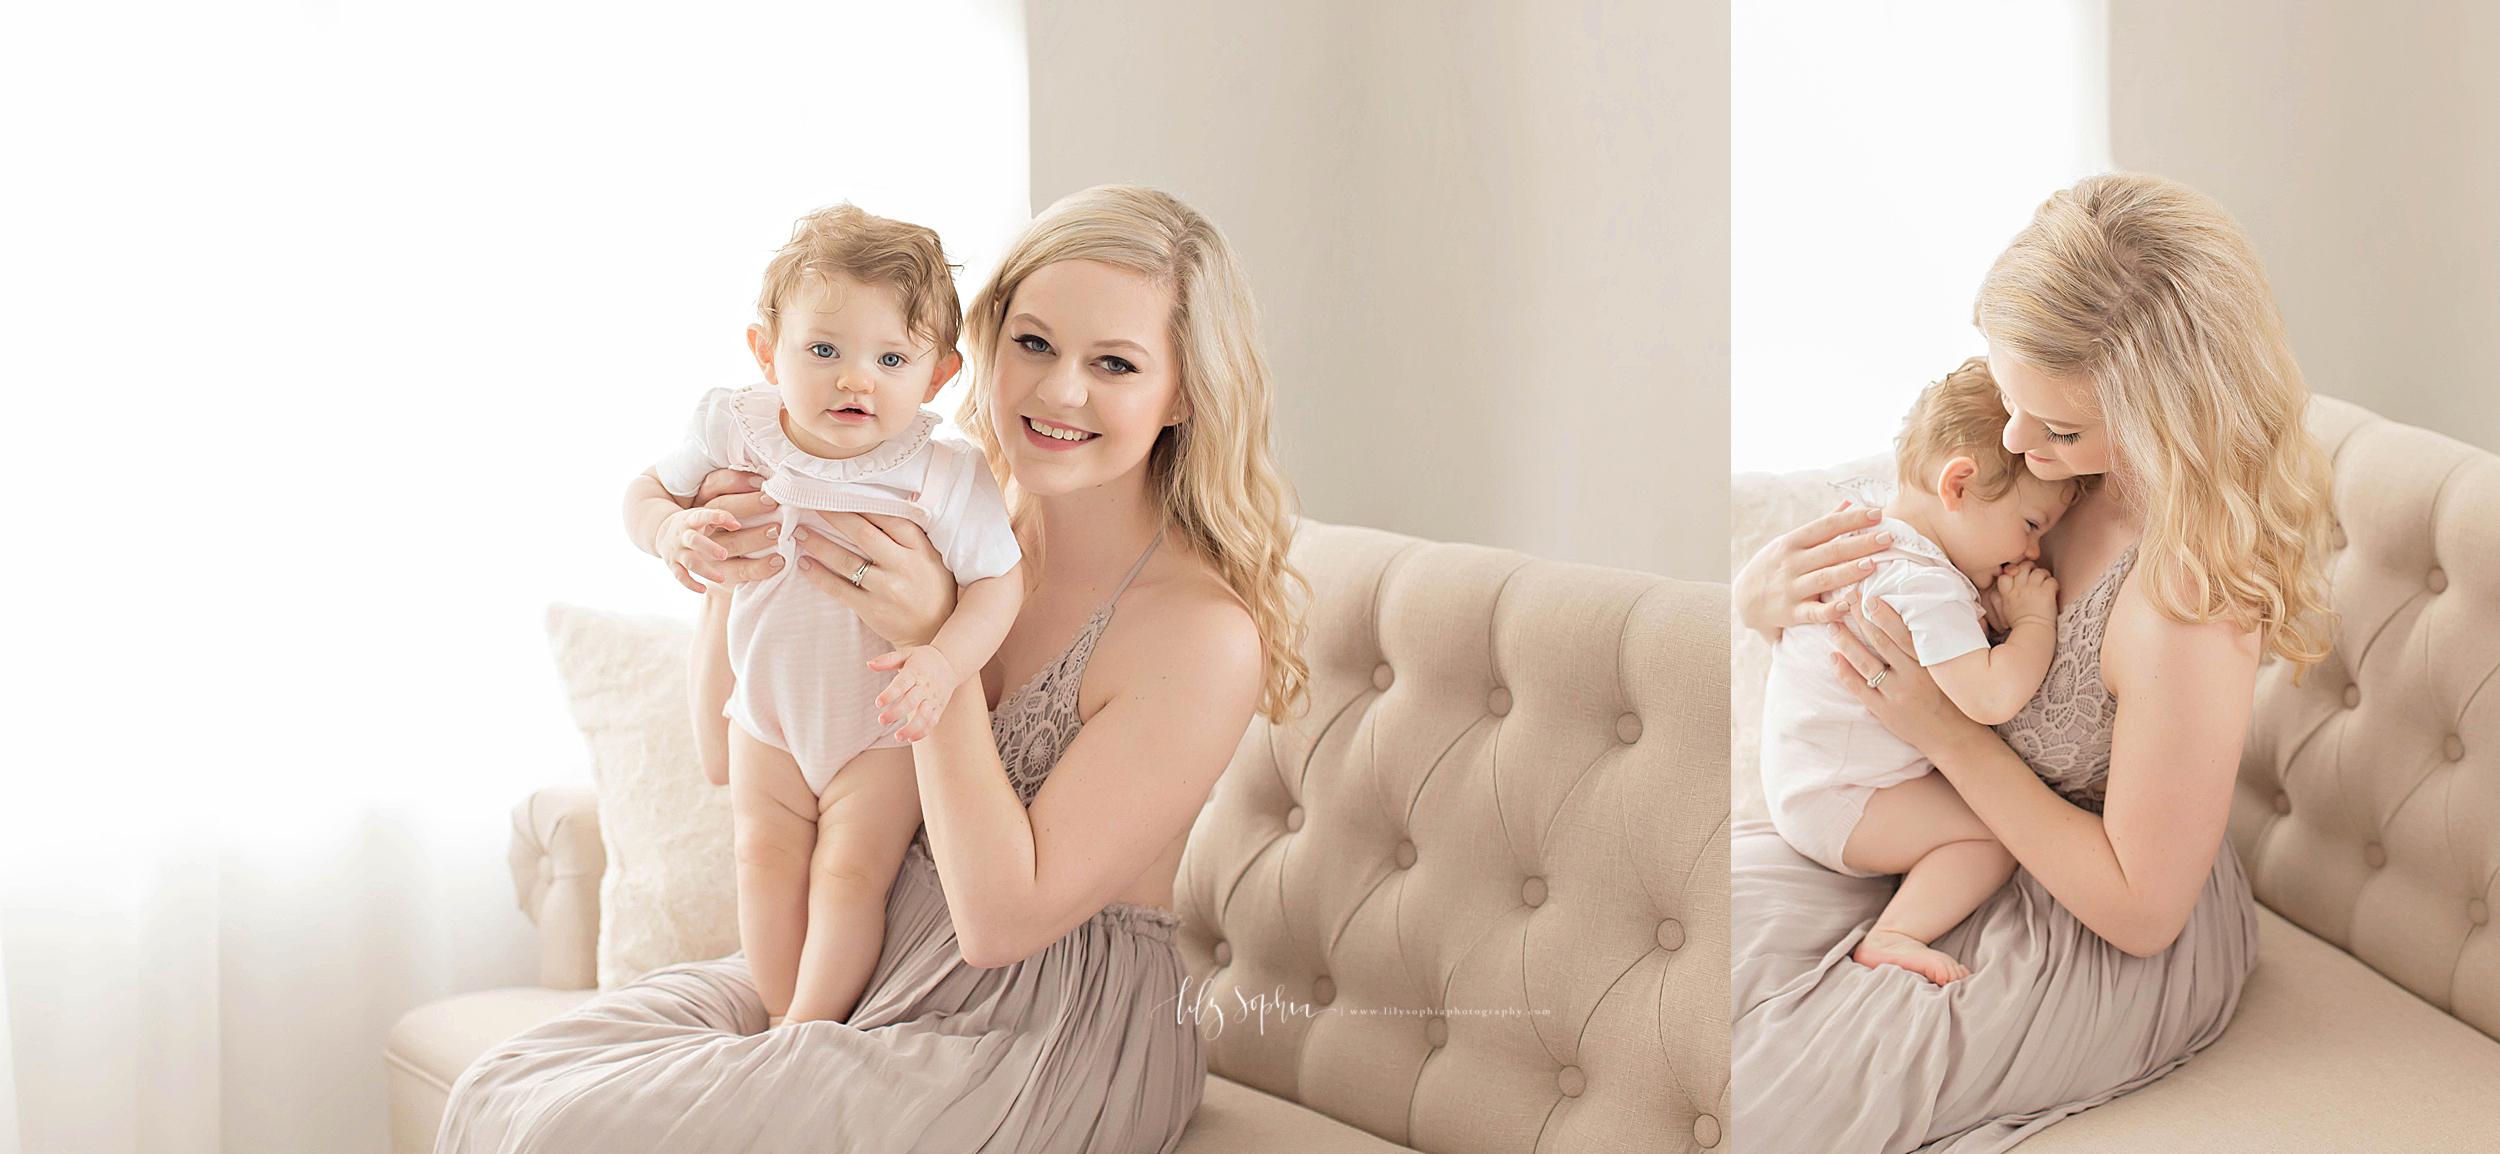 atlanta-midtown-brookhaven-decatur-lily-sophia-photography-photographer-portraits-buford-savannah-baby-girl-nine-months-family-milestone-photos_0181.jpg